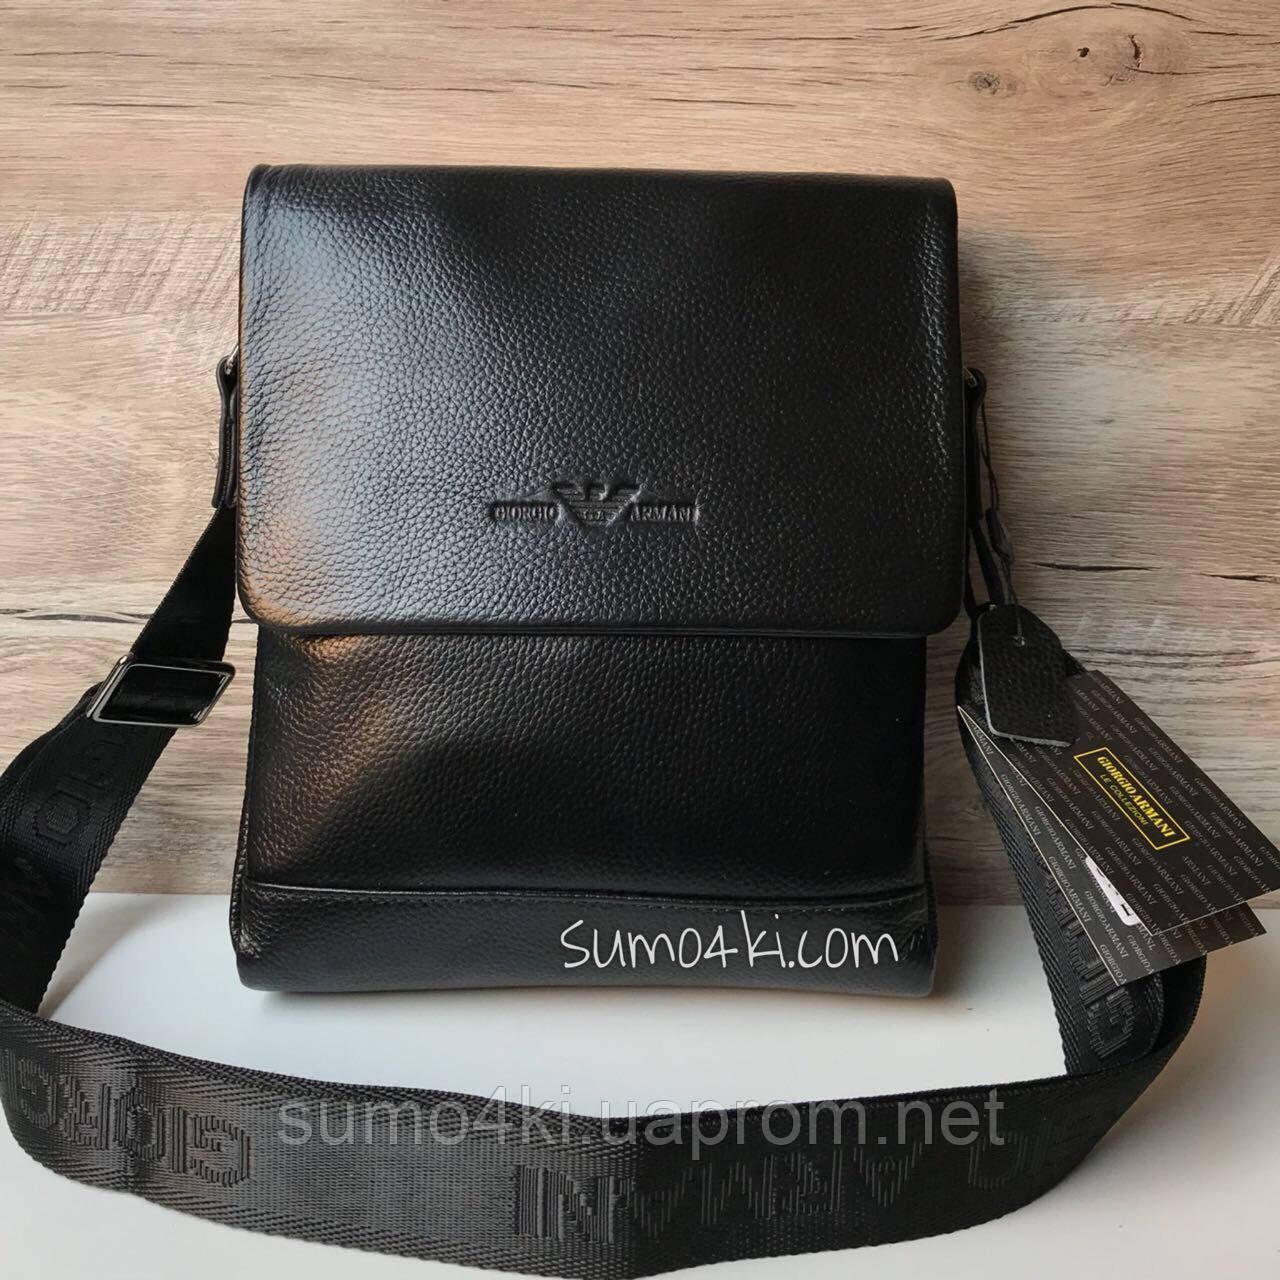 9a57dea2a05a Мужская кожаная сумка через плечо Armani Армани - Интернет-магазин «Галерея  Сумок» в